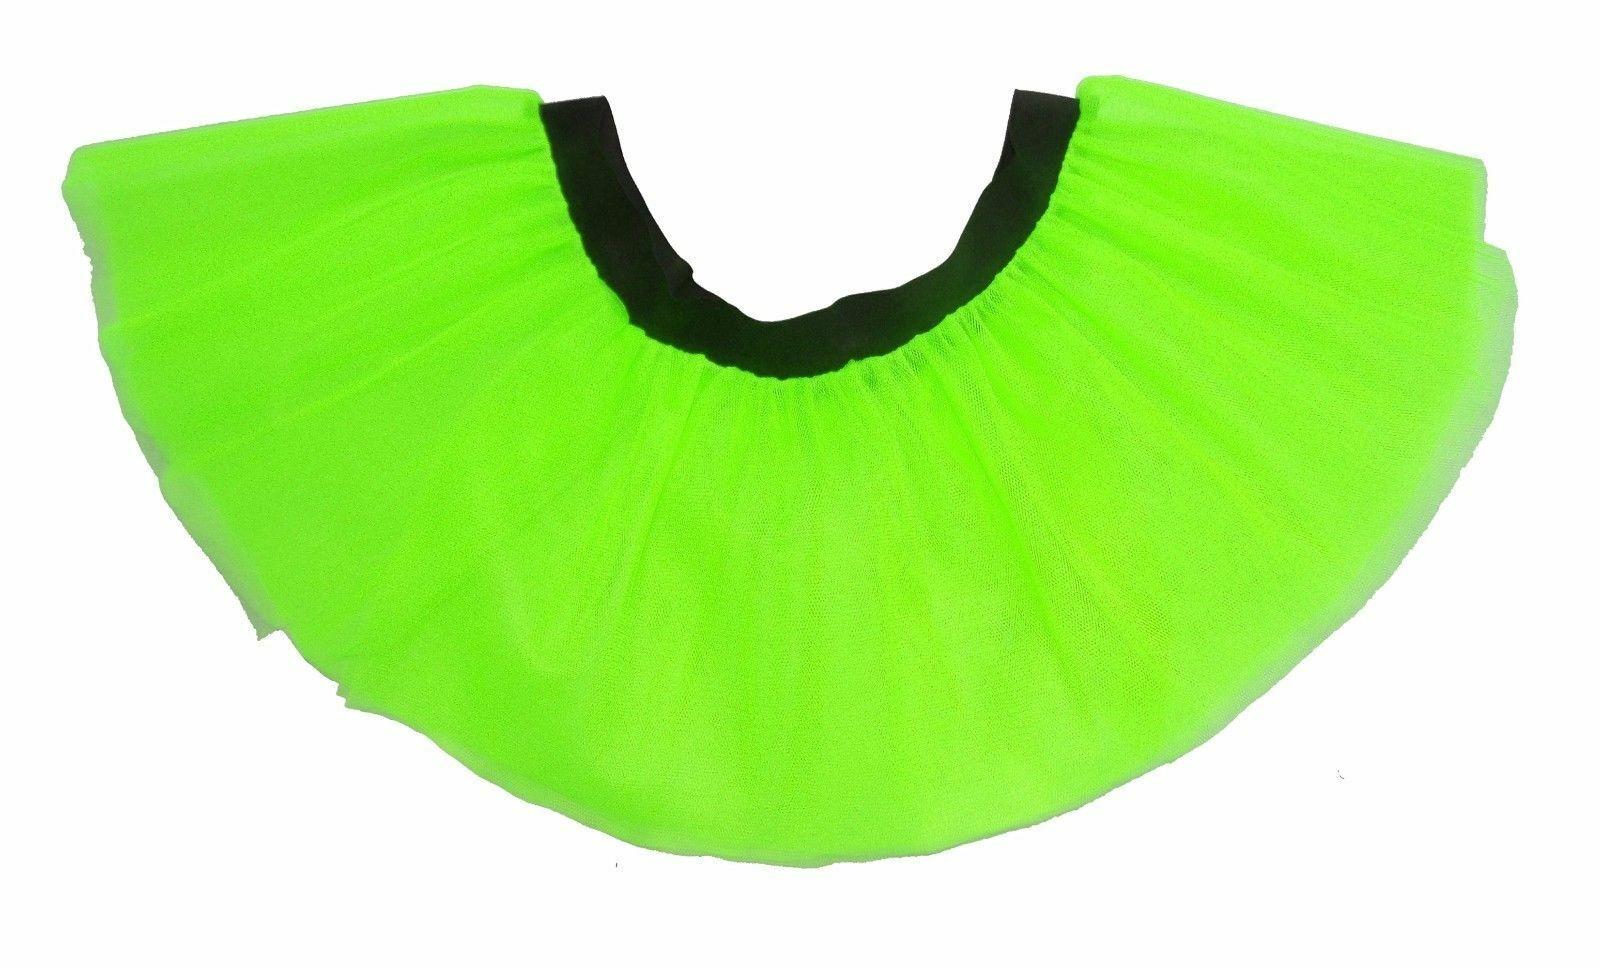 BNWT CHILD GIRLS AGE 10 - 12 GREEN NEON PINK TUTU BALLET SKIRT 80S FANCY DRESS